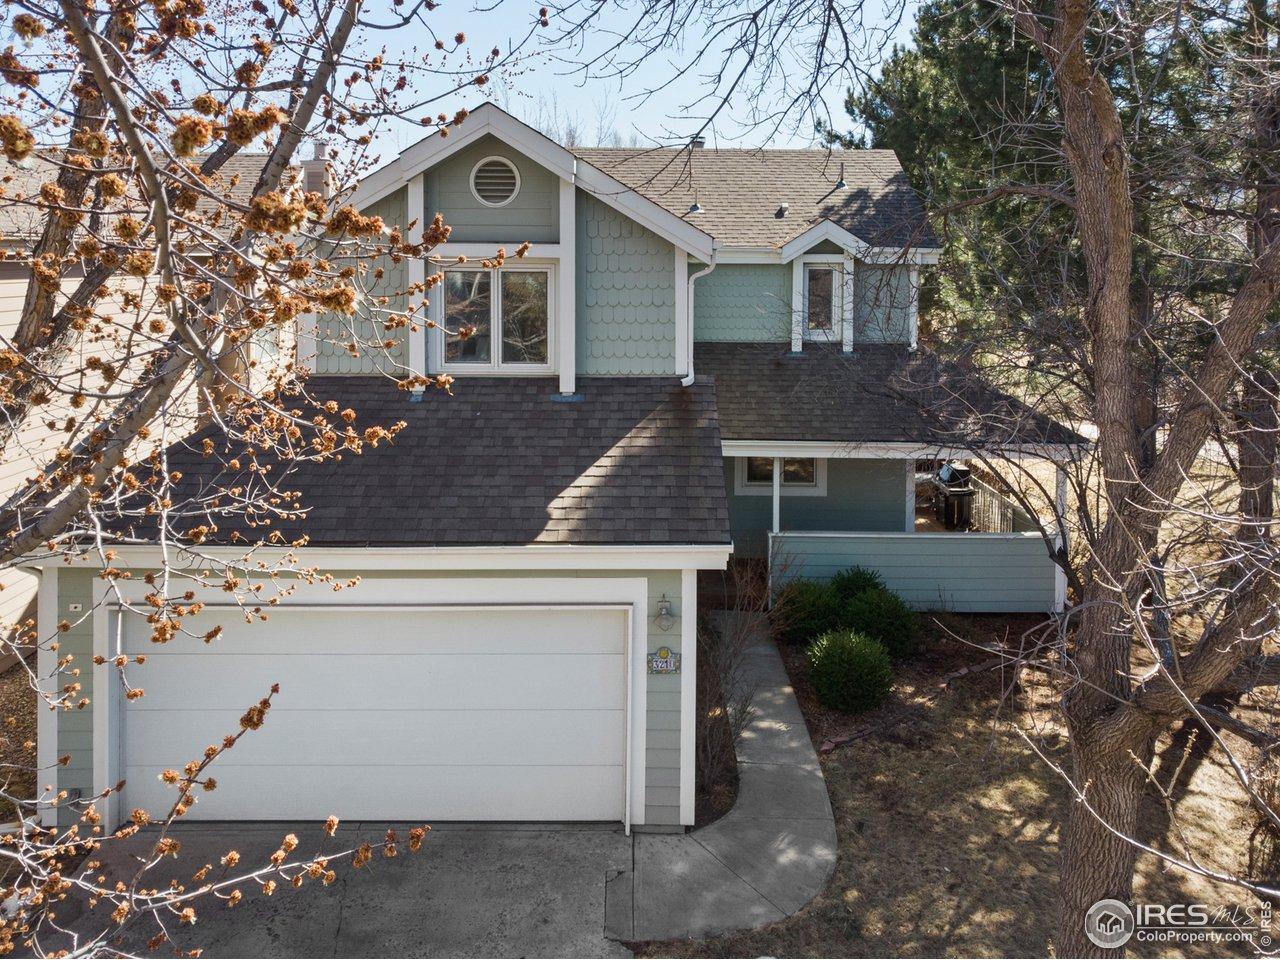 3210 15th St, Boulder CO 80304